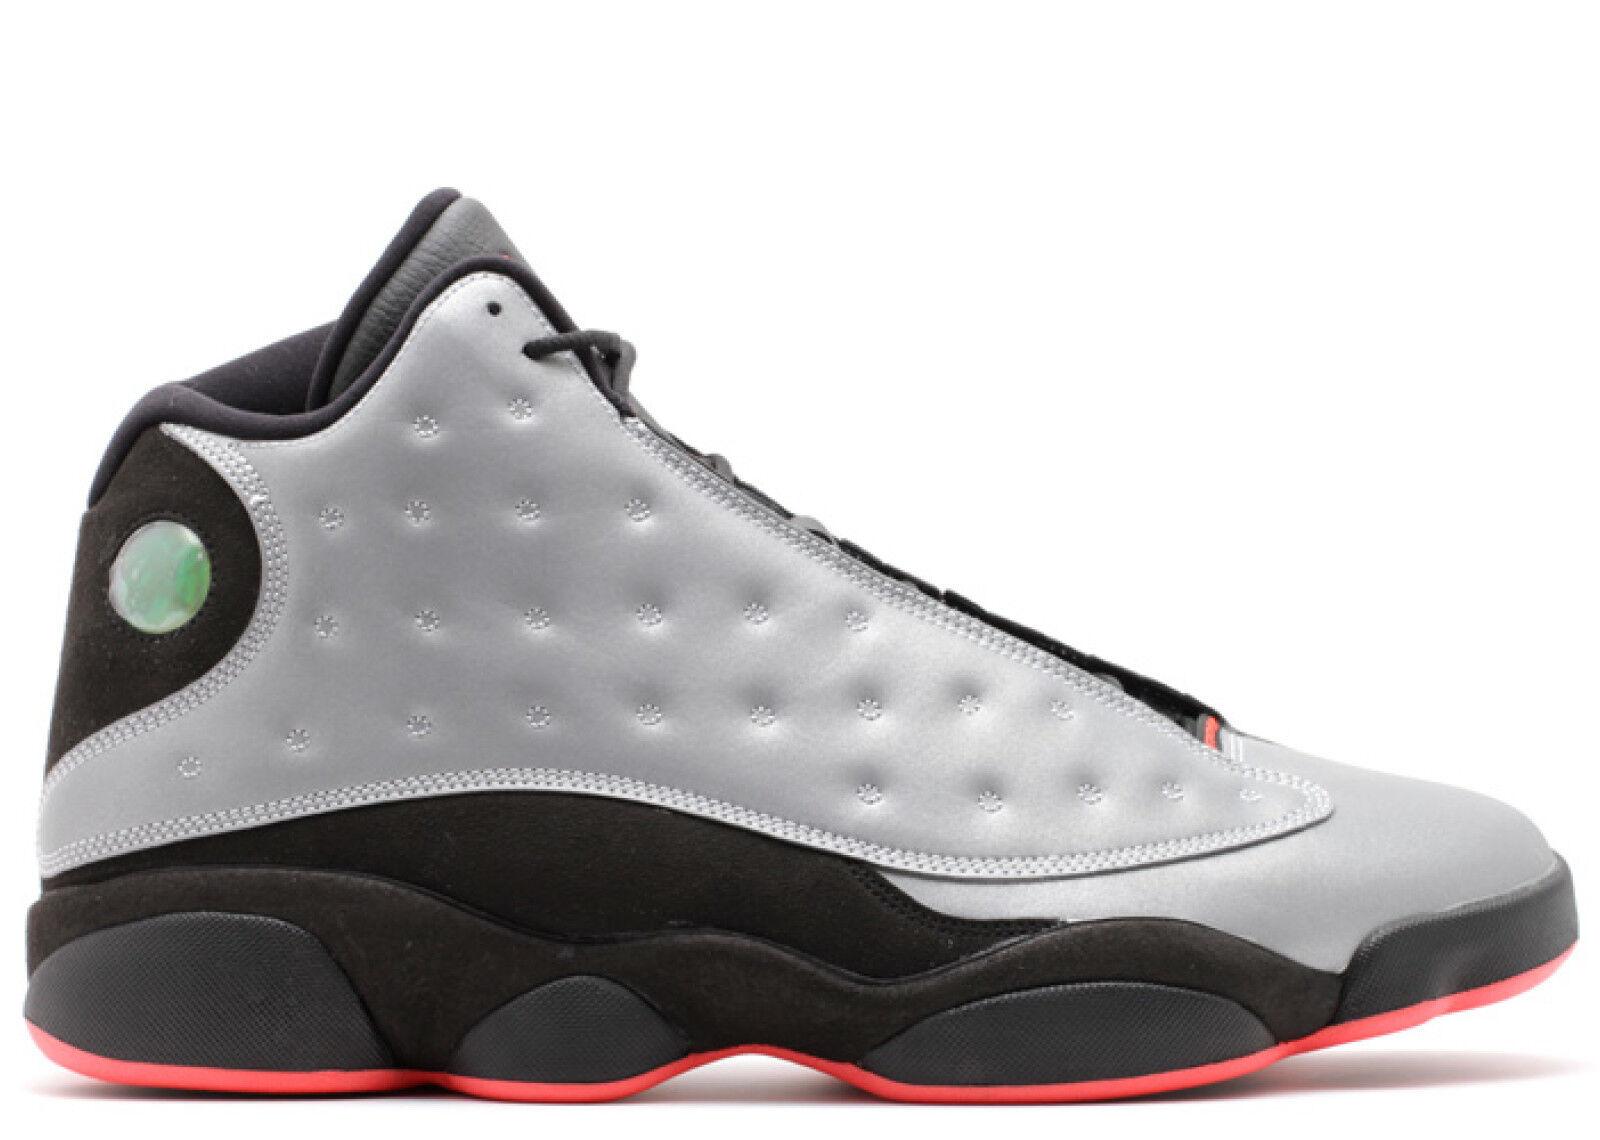 Mens Nike Air Jordan 13 Retro Prm - 696298 023 - Reflective Silver Black Train